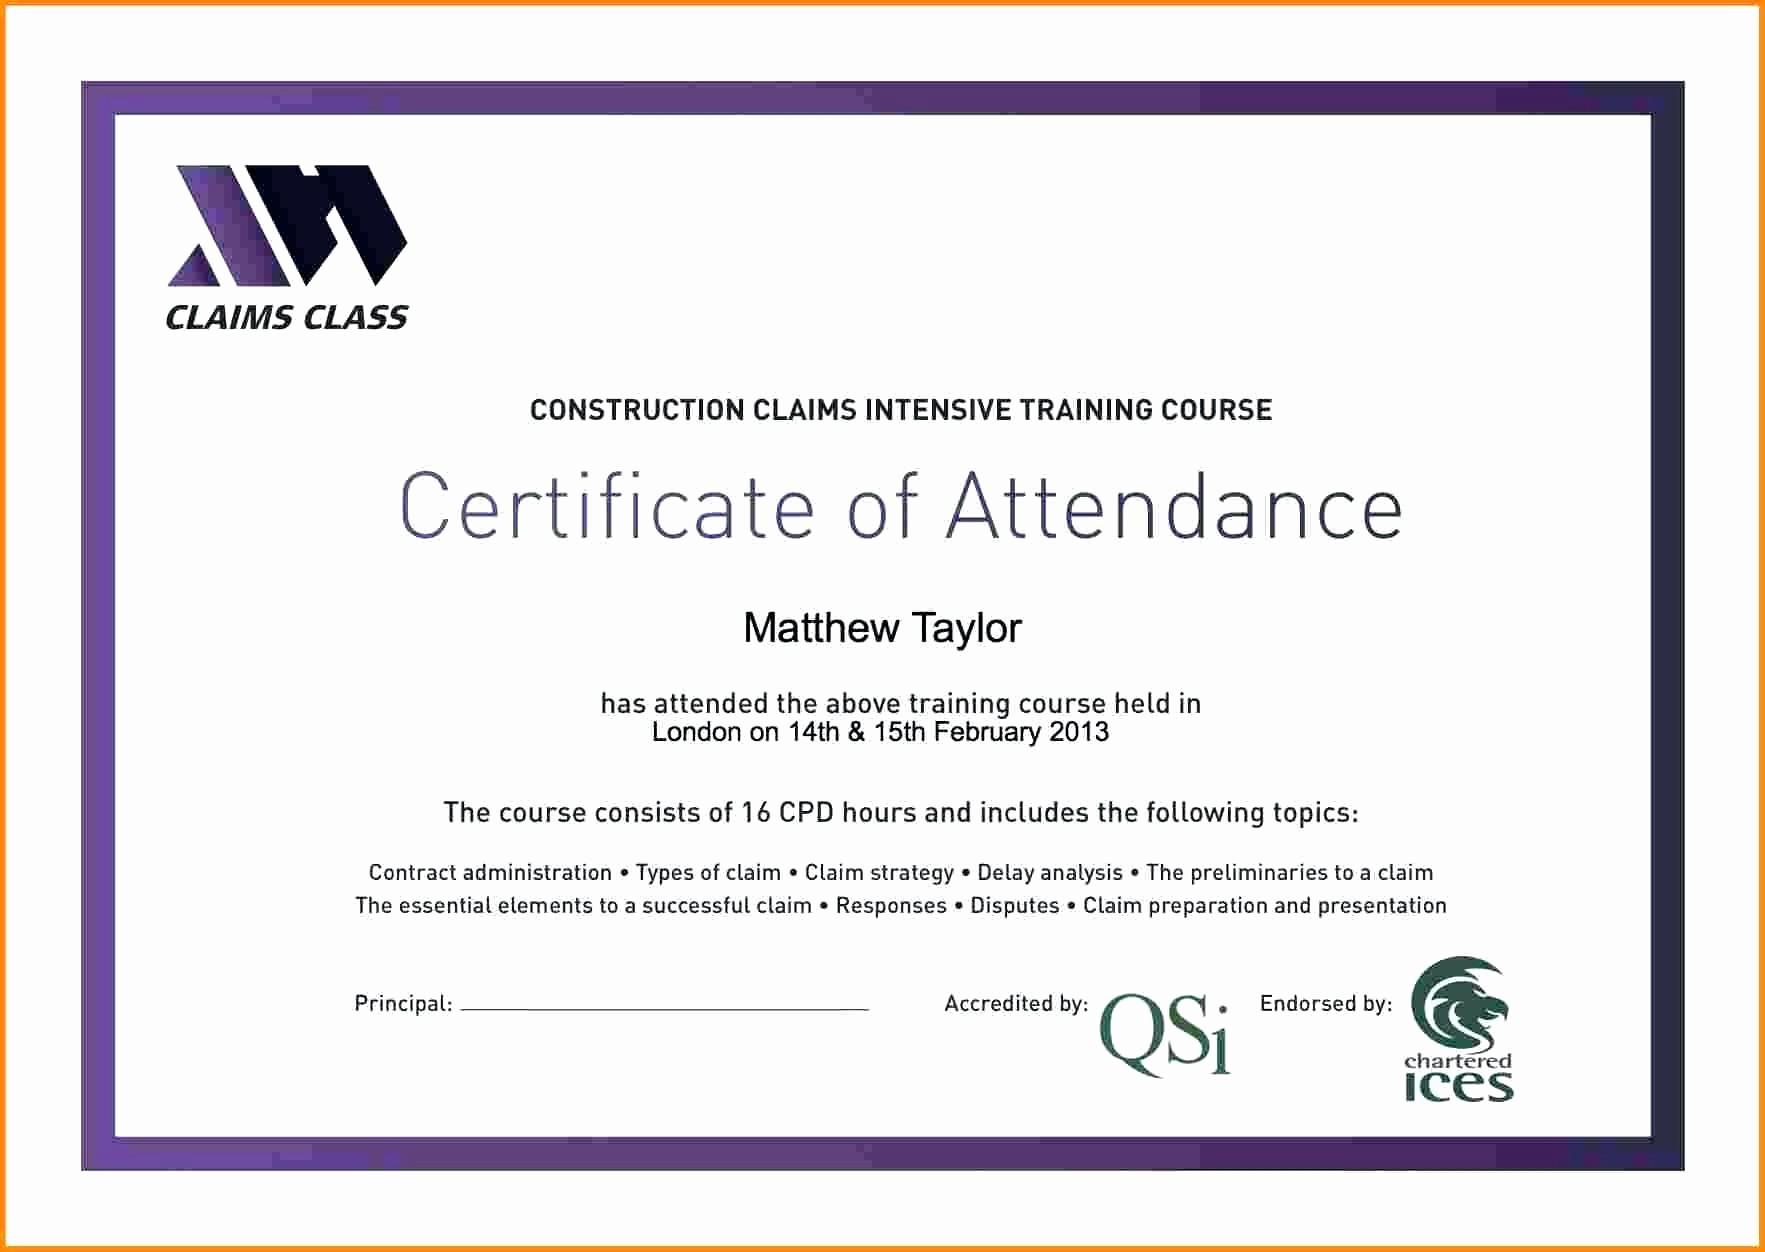 Congratulations Certificate Template Microsoft Word Lovely Template Congratulations Certificate Template Word